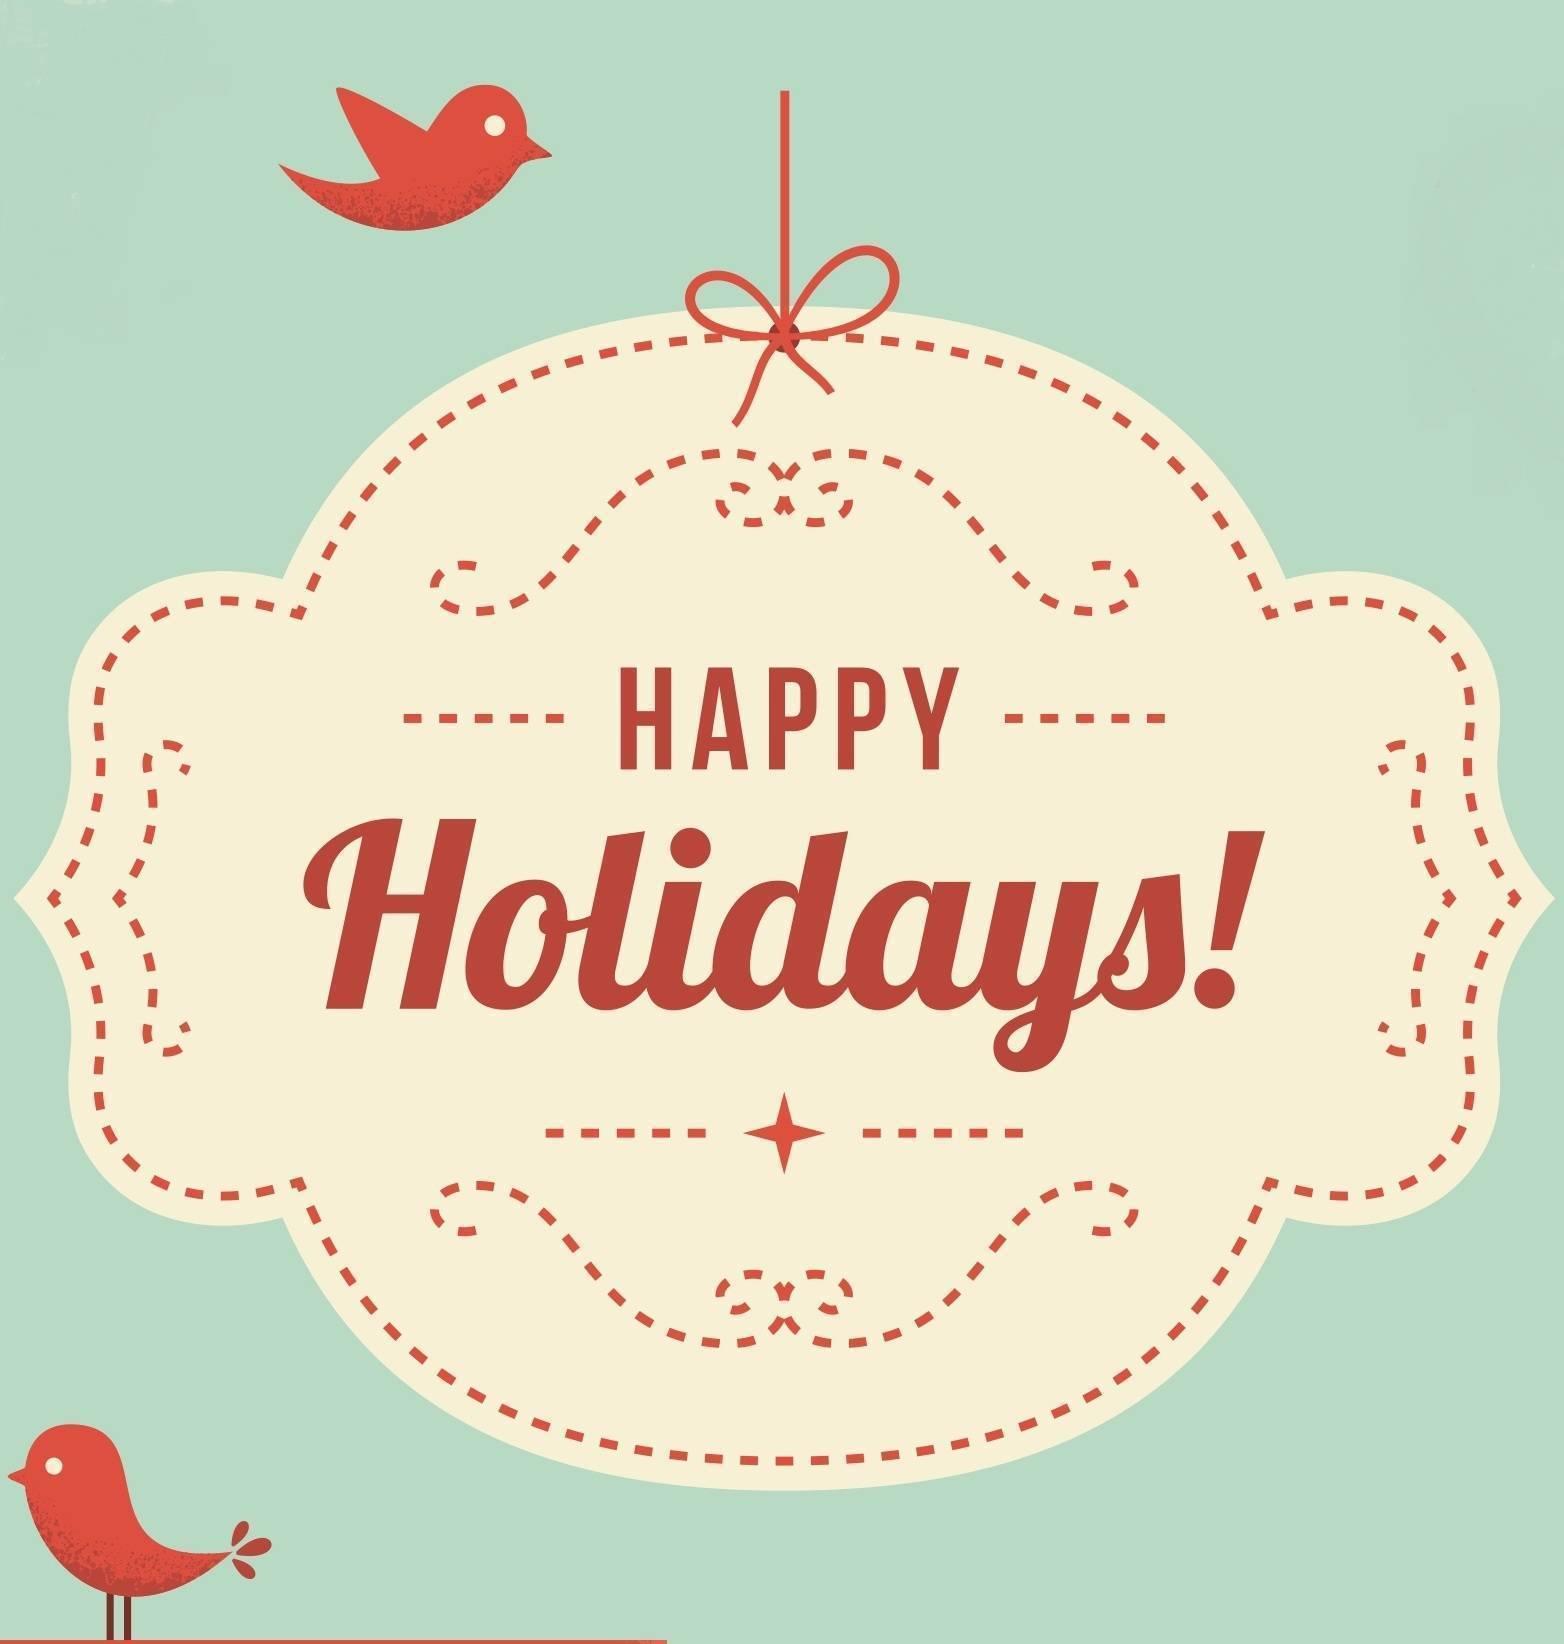 4bf498d1562c027cee57_3bde49cf4b628cc6dacf_happy-holidays-wallpaper.jpg